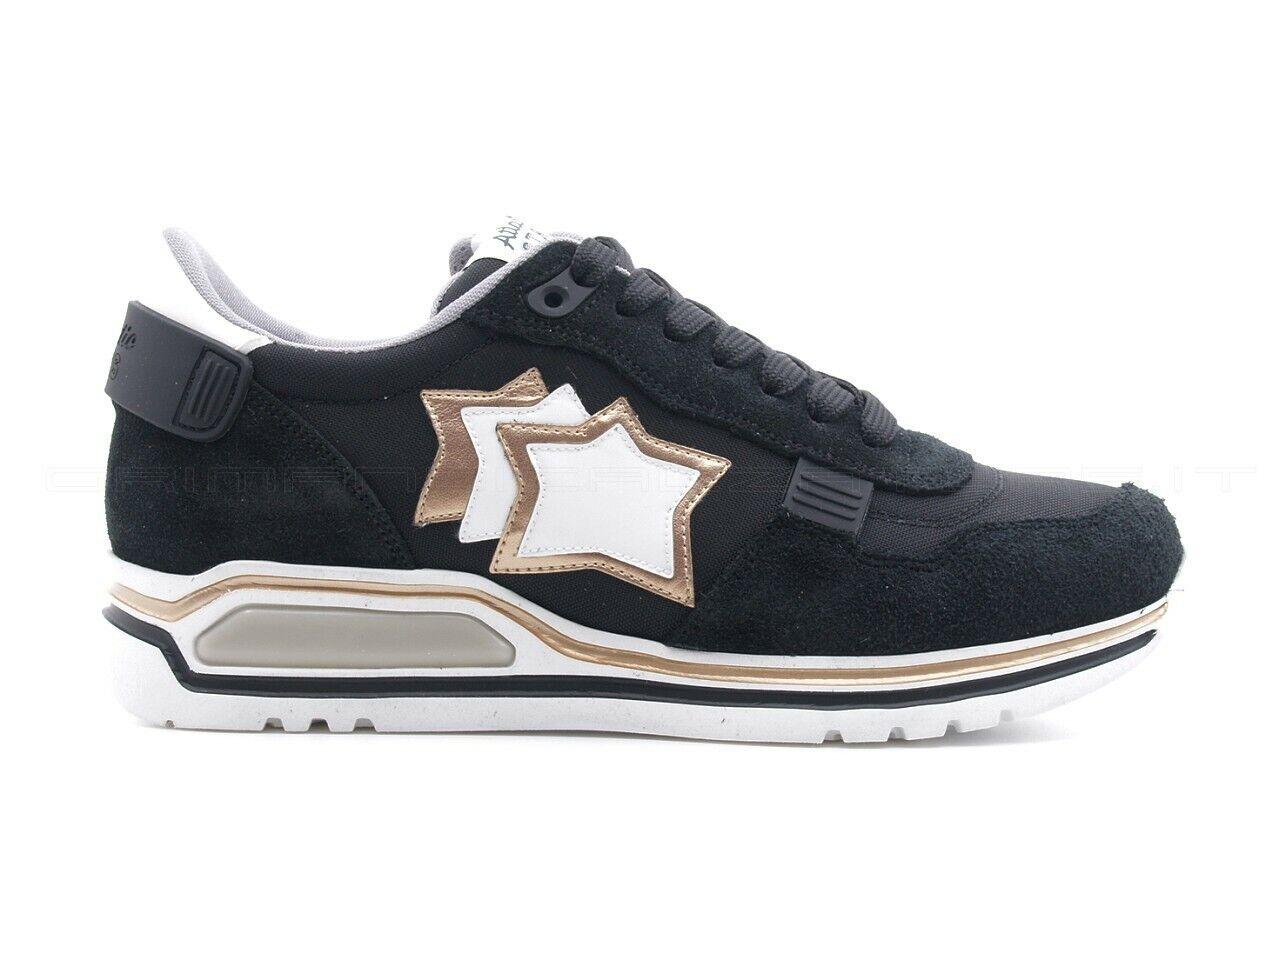 Schuhe Atlantic Stars Damen Schwarz, Sterne Gold Weiß, Sohle XL, SHAKA-NN-J06